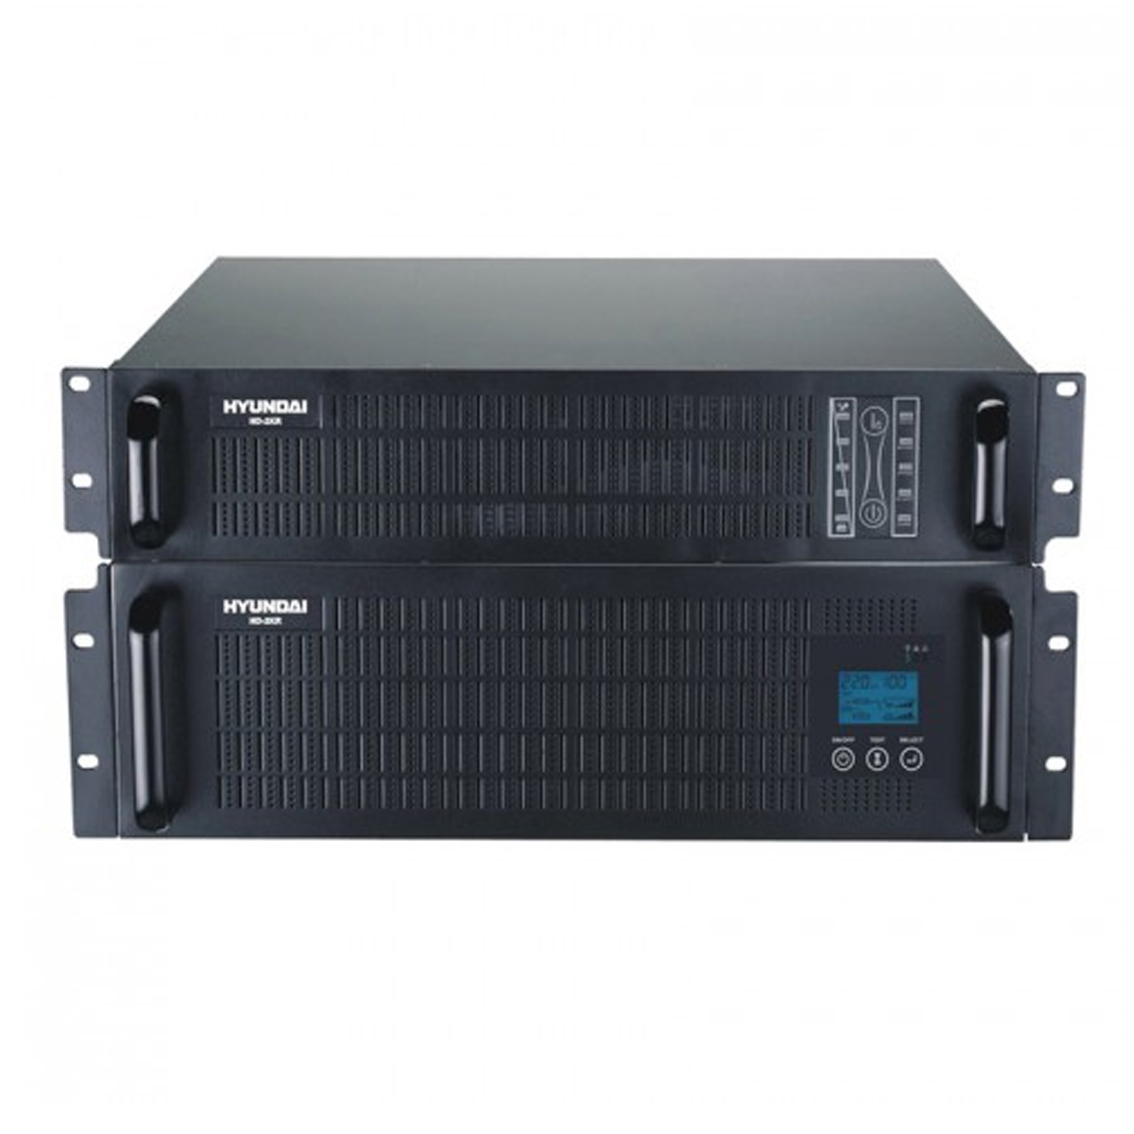 UPS Rack Online 10KVA Hyundai HD-10KR